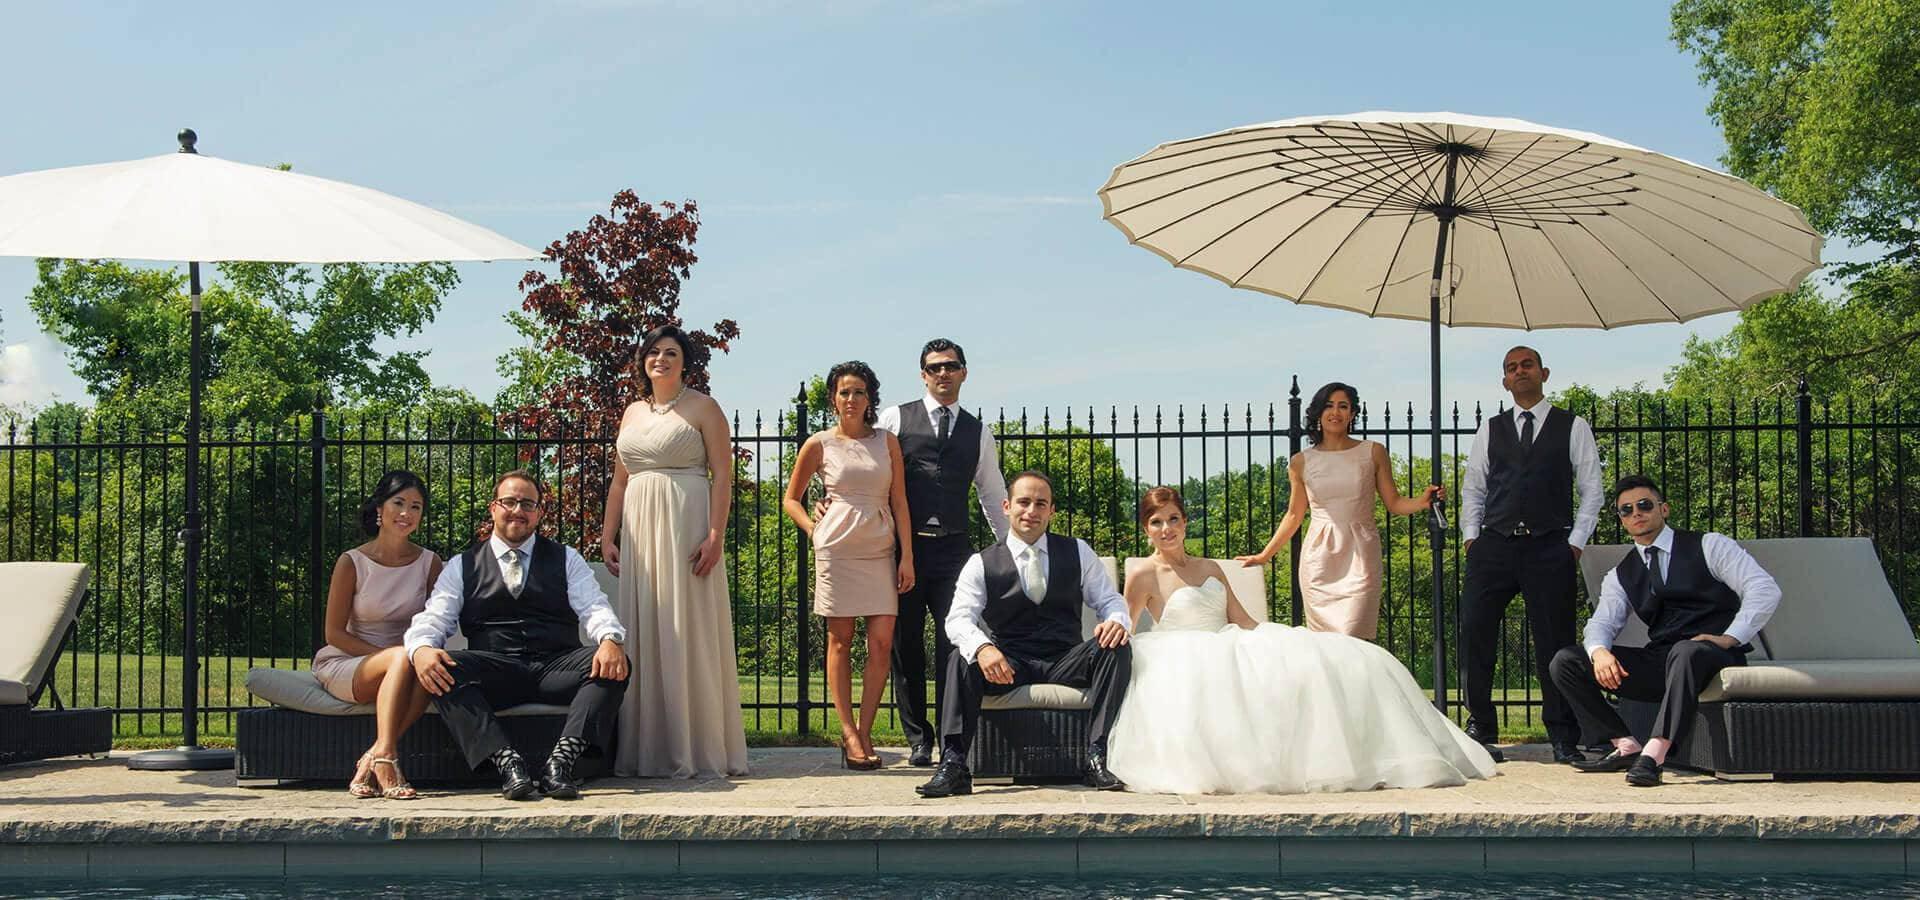 Hero image for Elizabeth & Bill's Elegant Wedding at Crystal Fountain